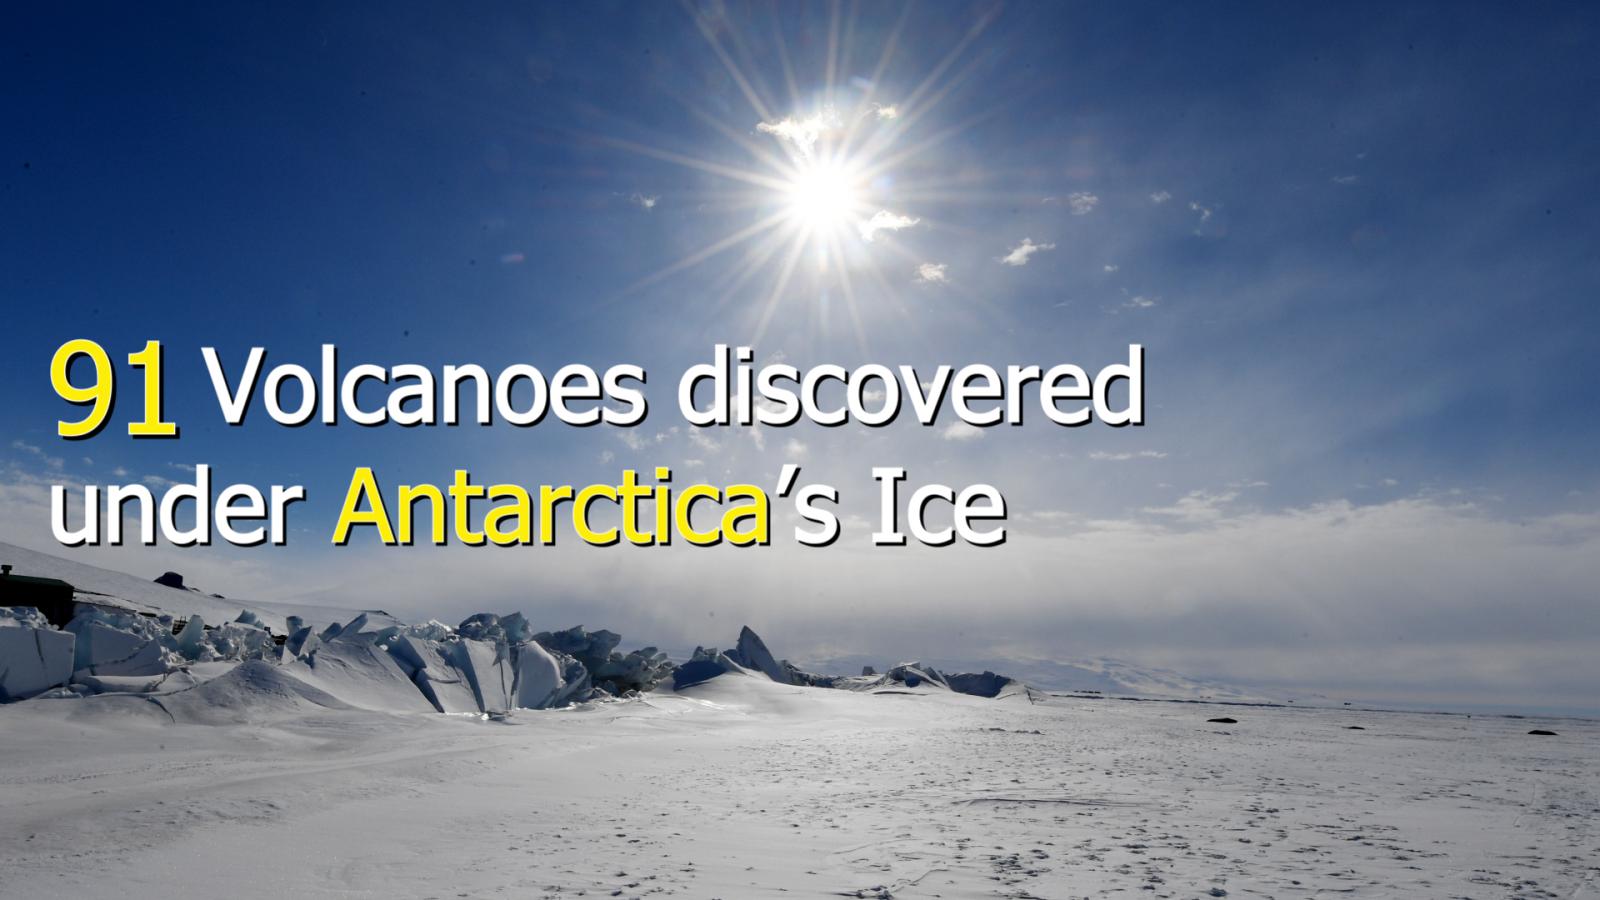 91-volcanoes-discovered-under-antarcticas-ice